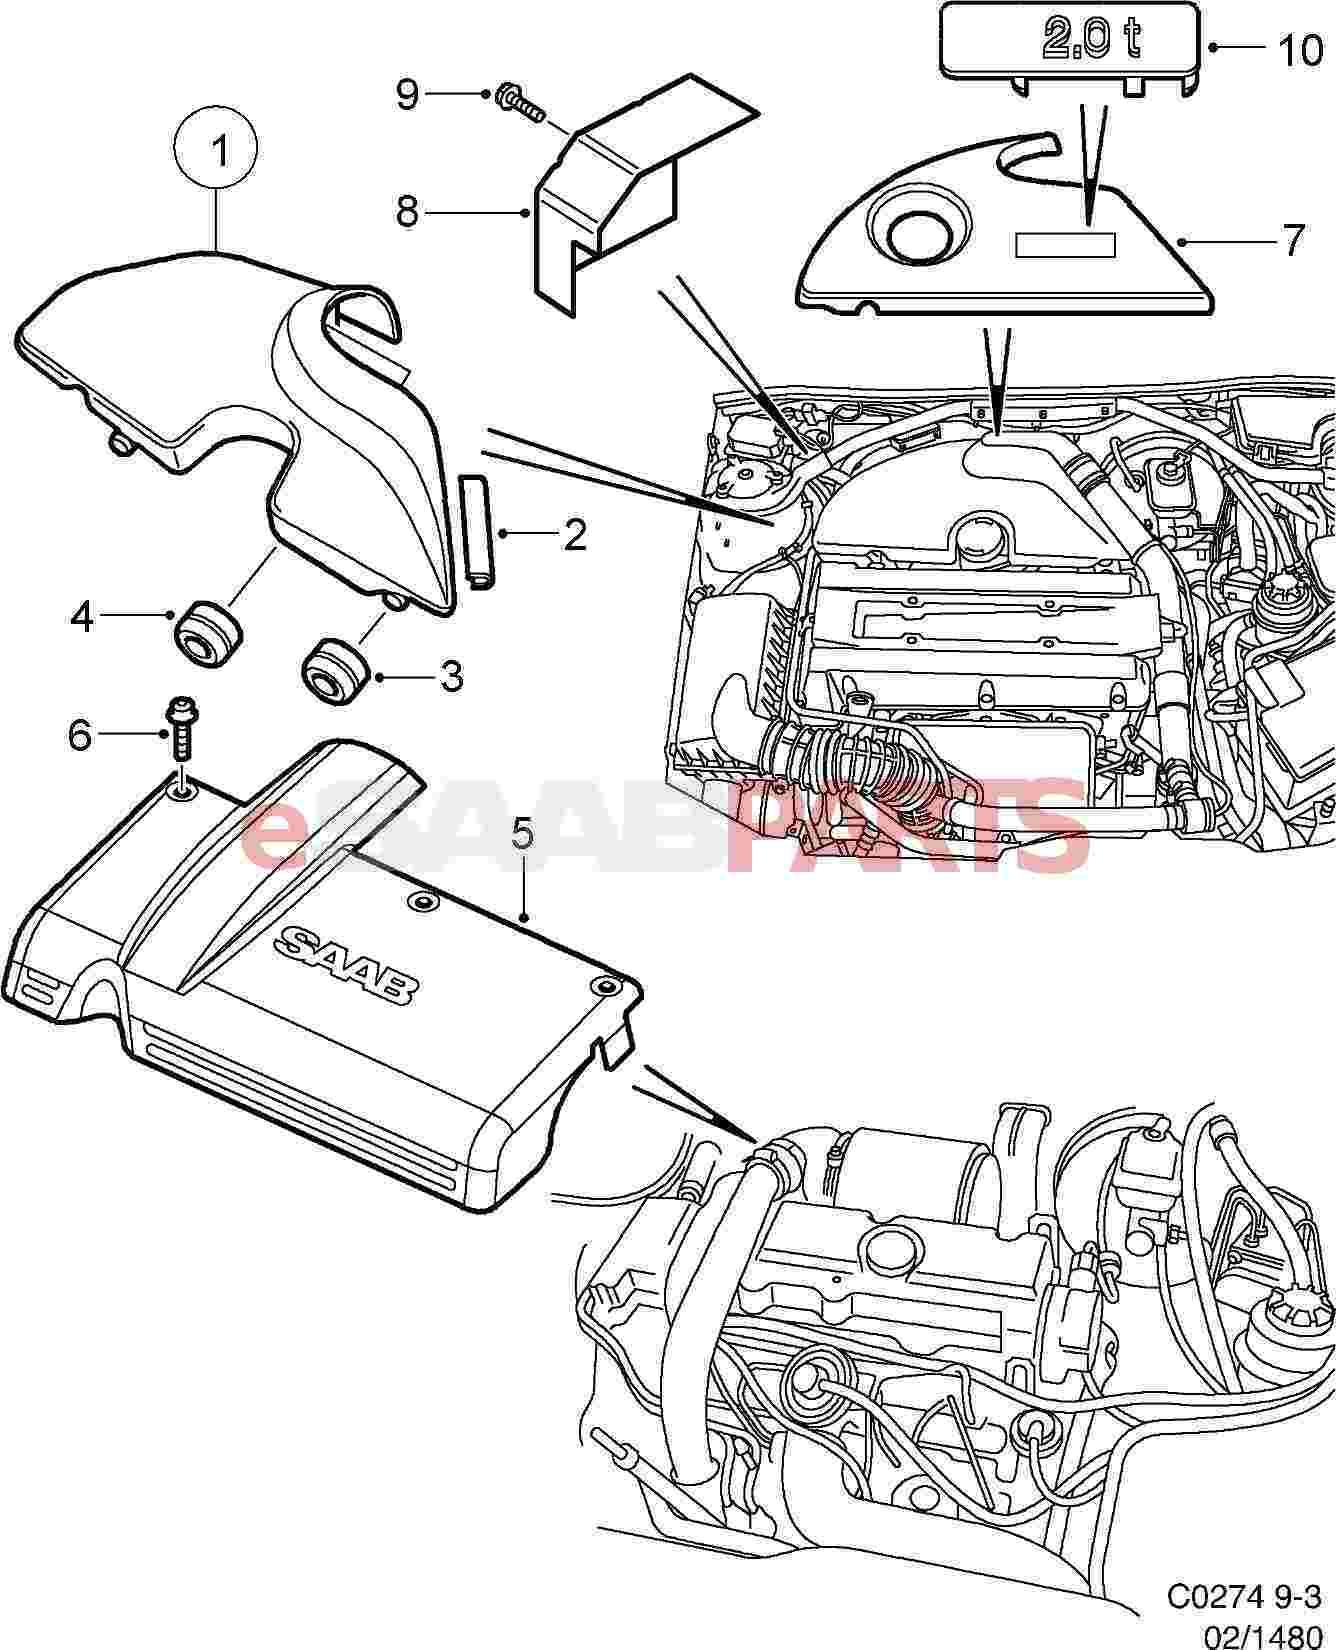 Saab 93 Engine Diagram - 2000 Dodge Dakota Headlight Wiring -  polarisss.lalu.decorresine.itWiring Diagram Resource